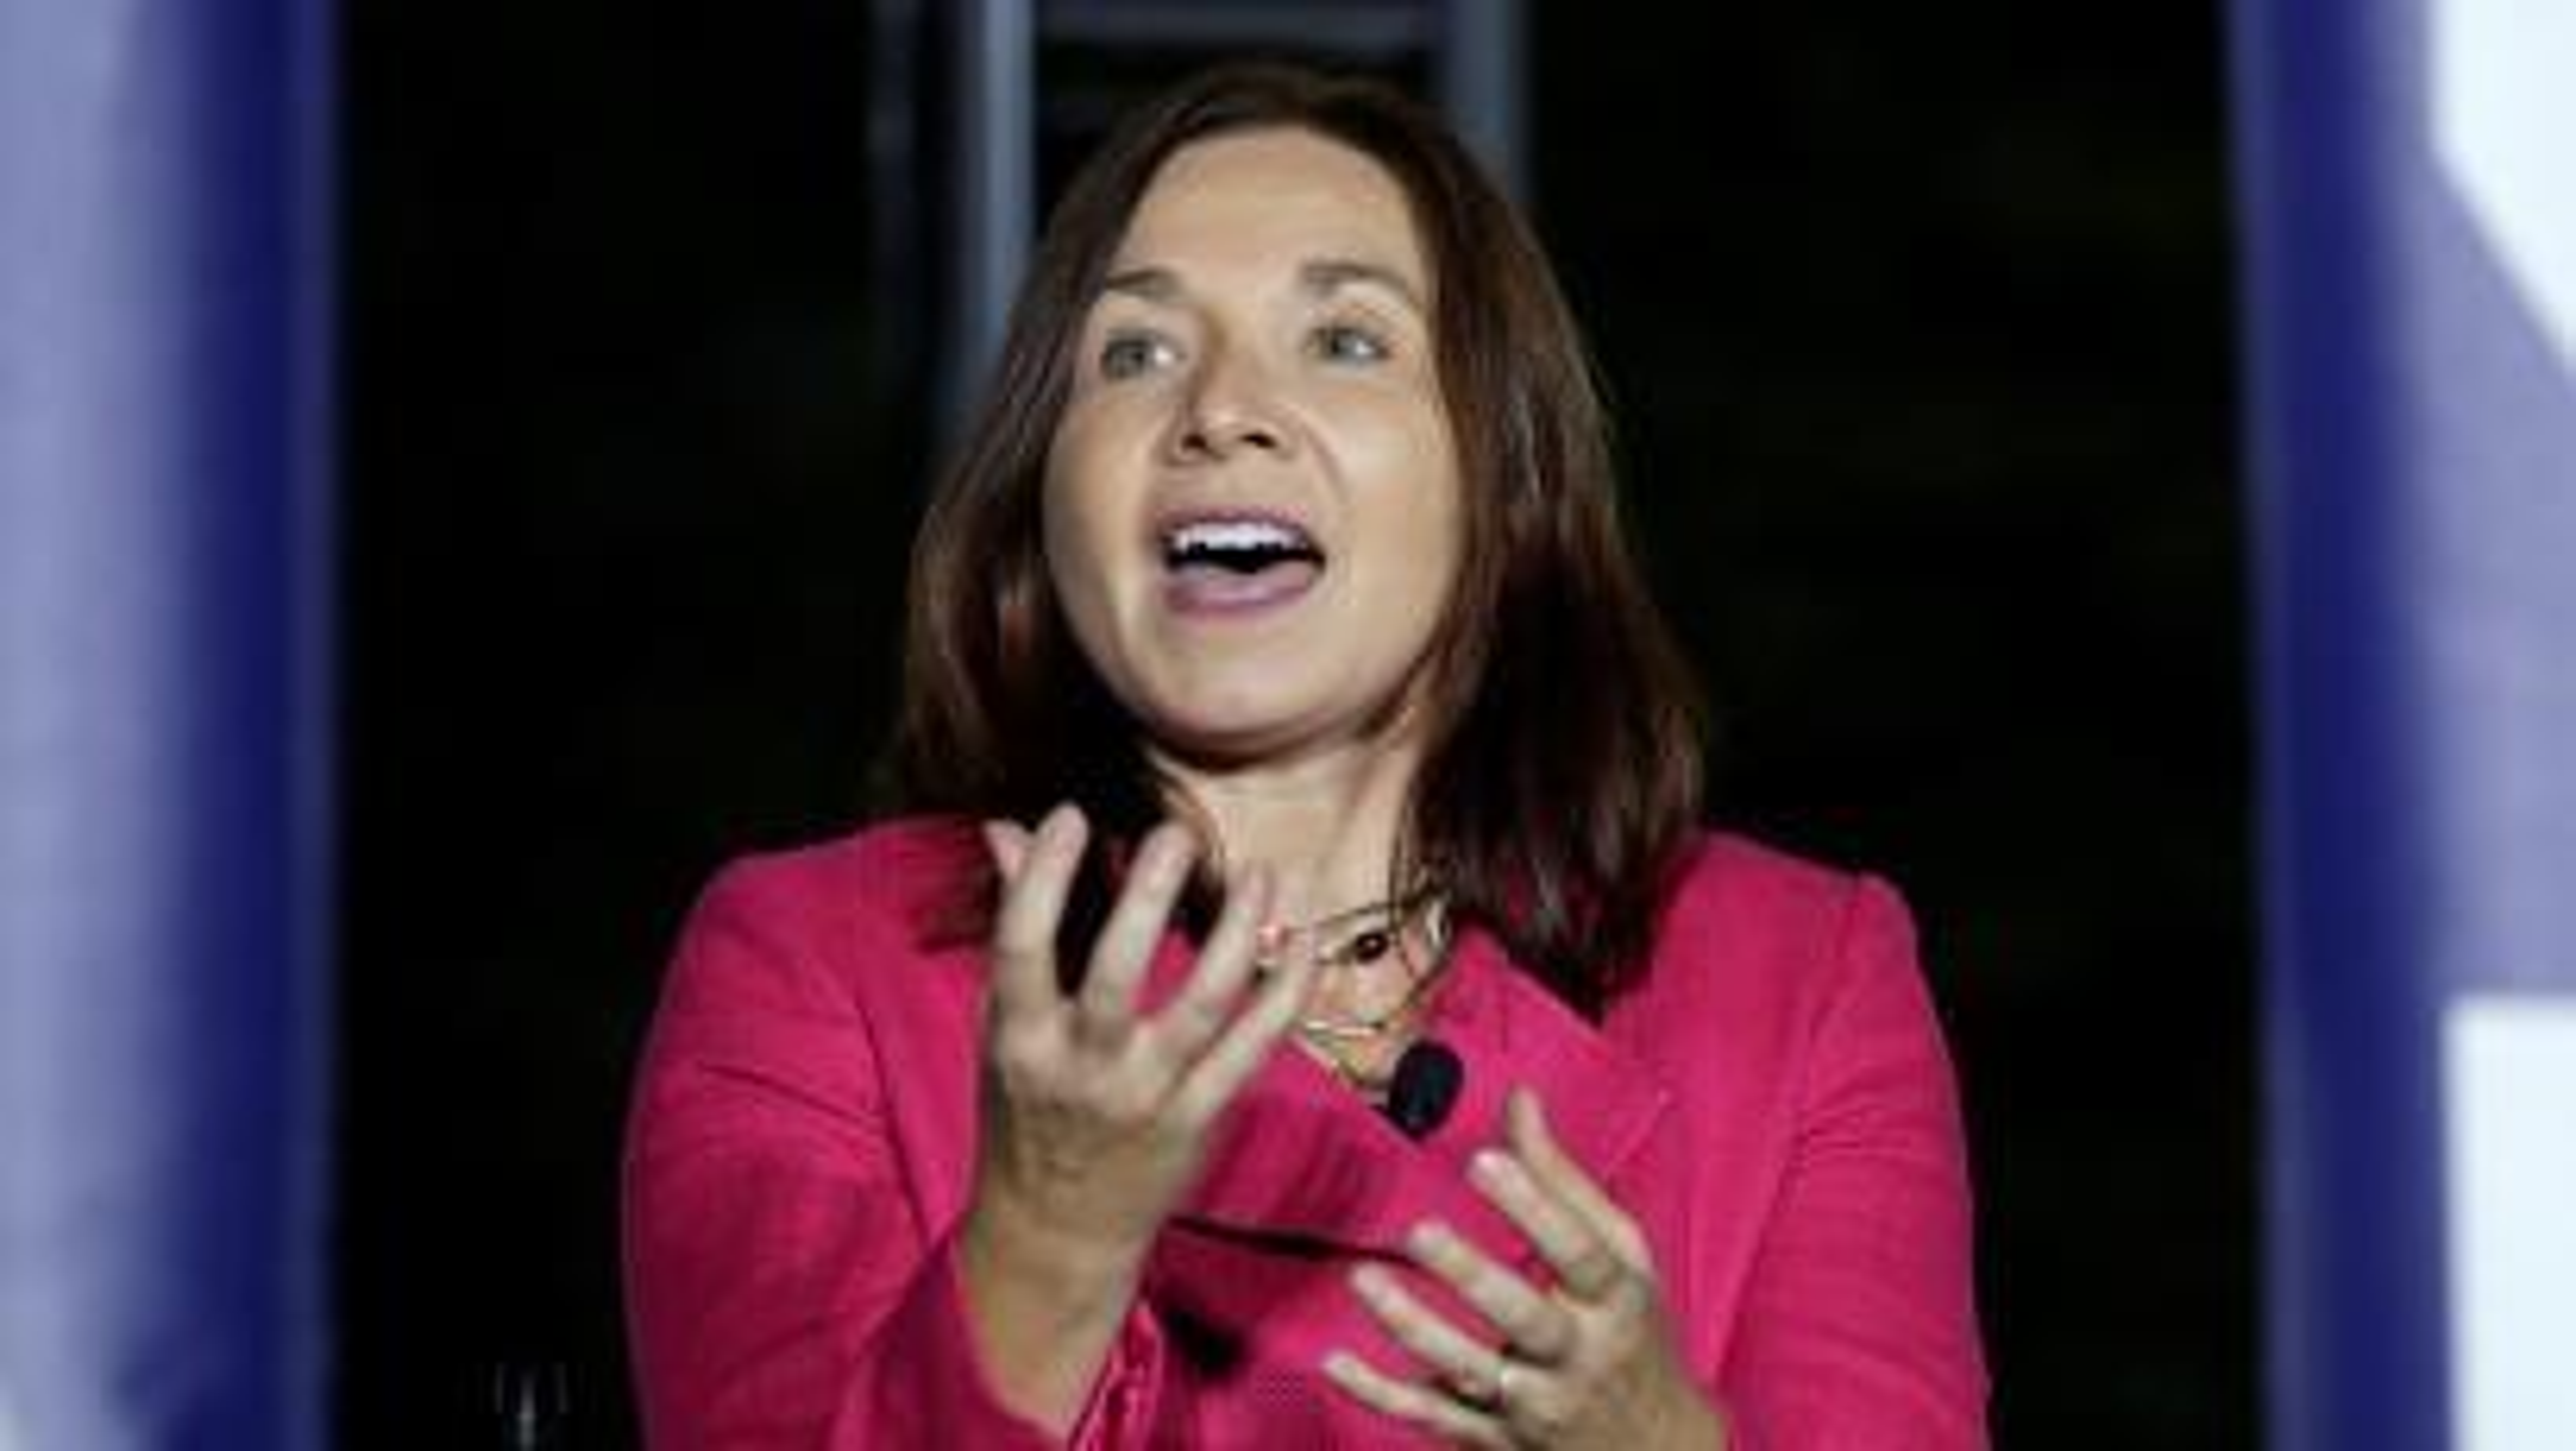 Climate scientist Katharine Hayhoe